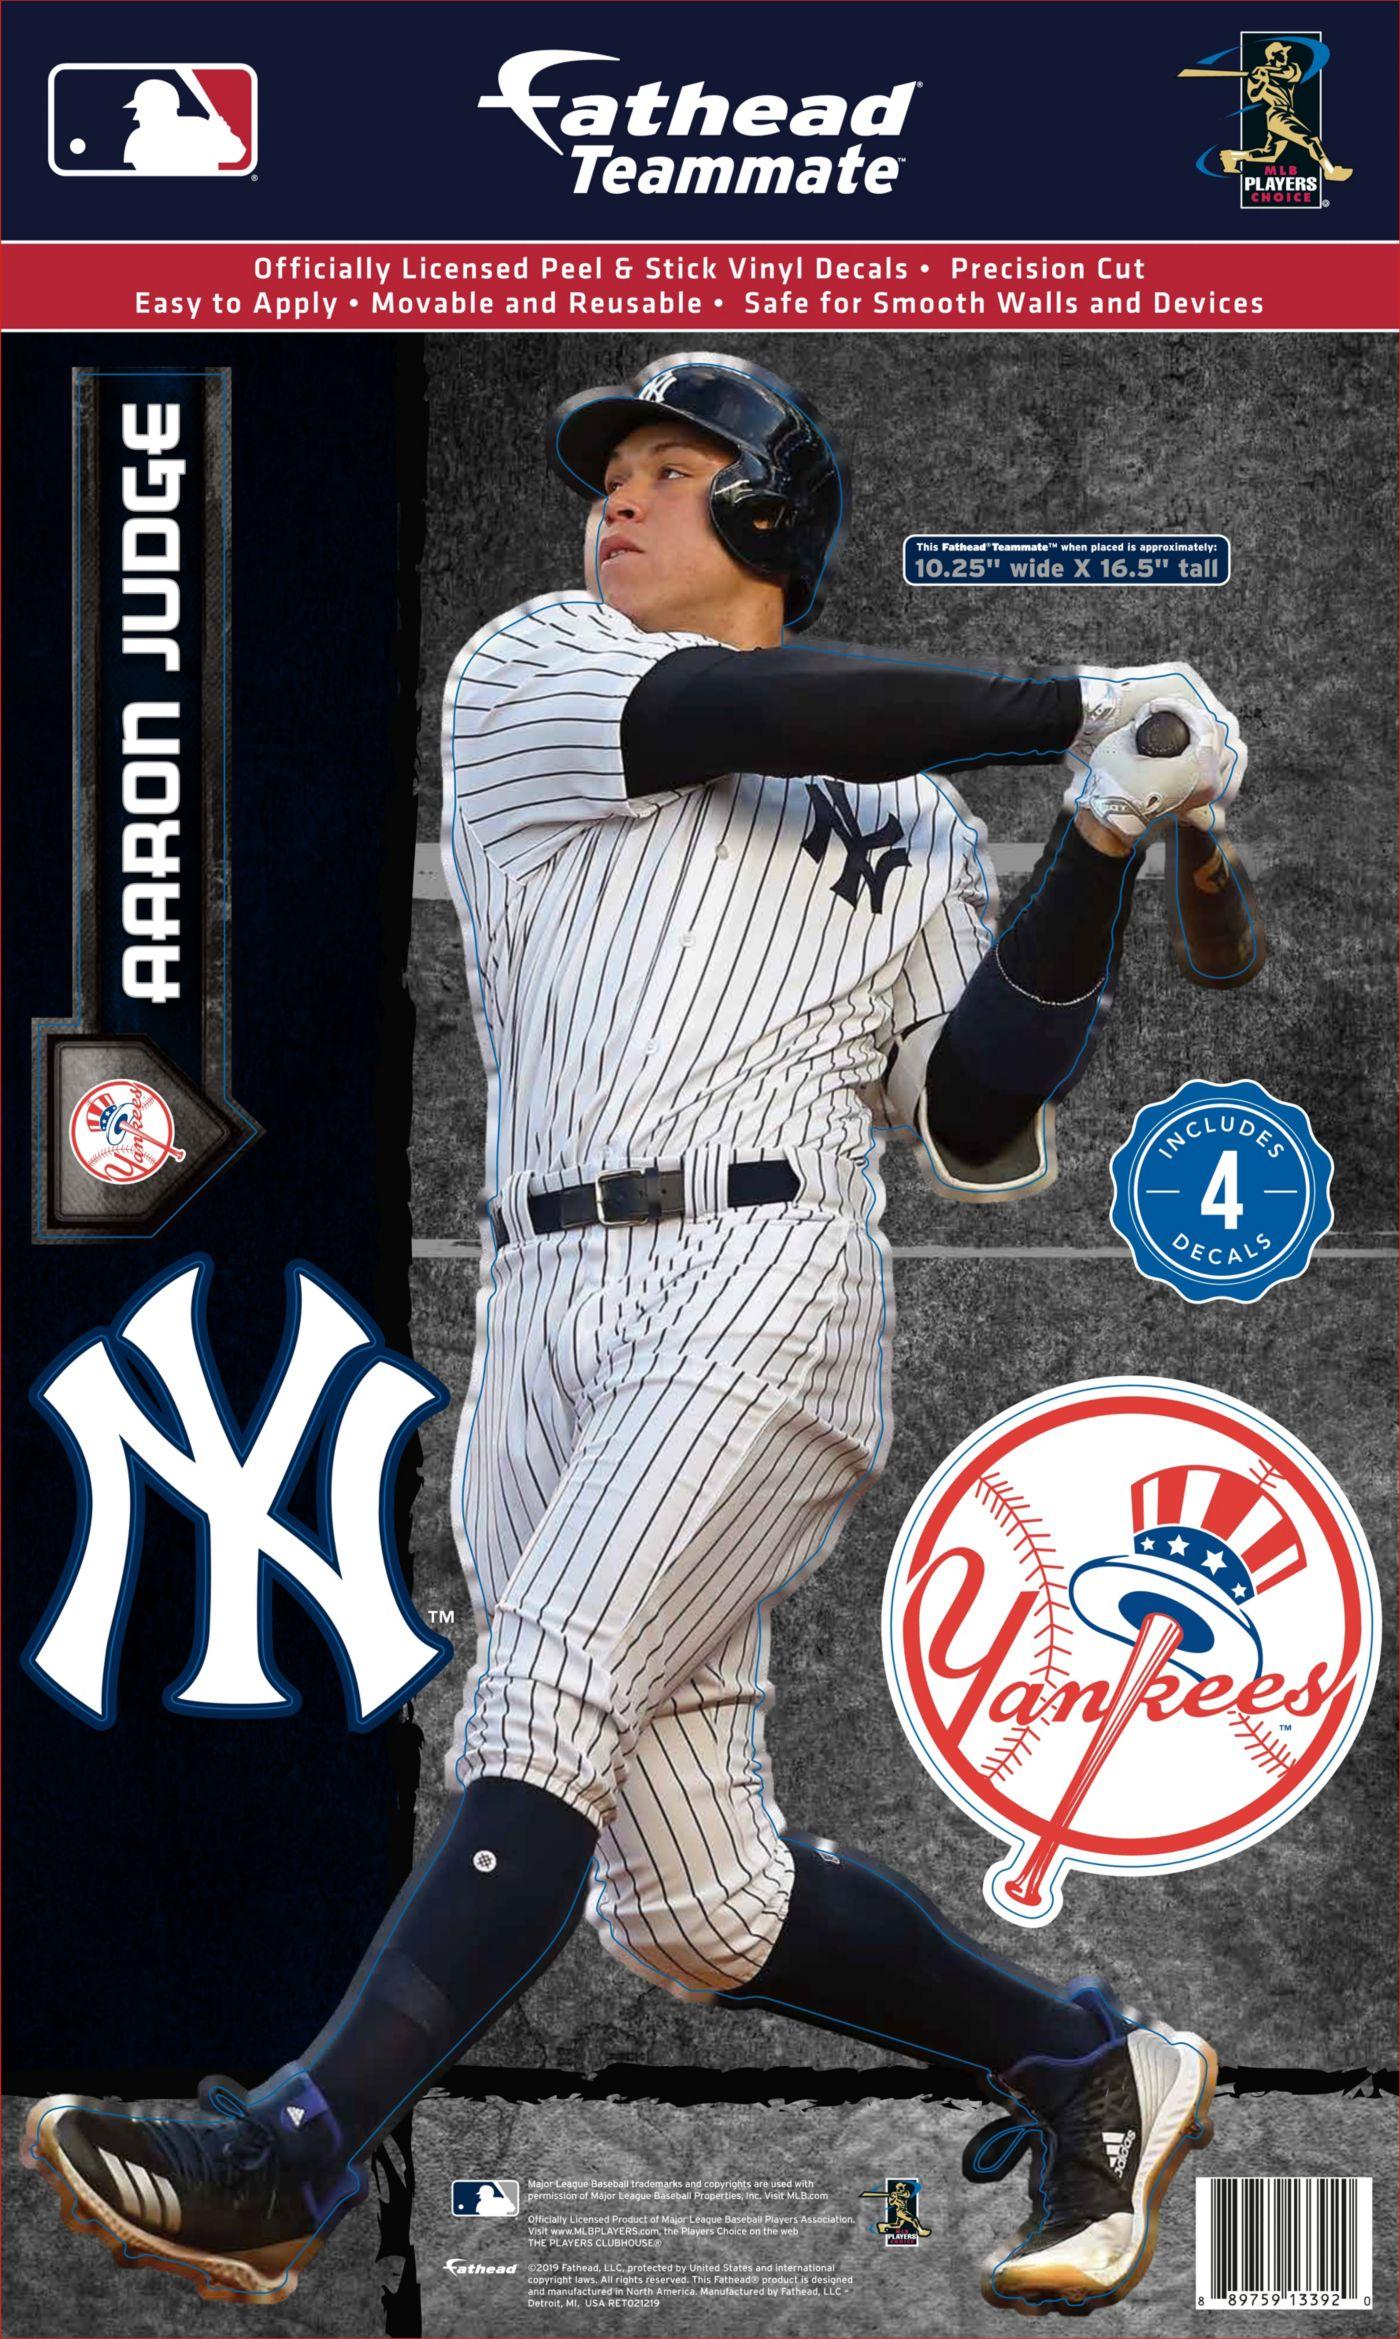 Fathead New York Yankees Aaron Judge Teammate Wall Decal